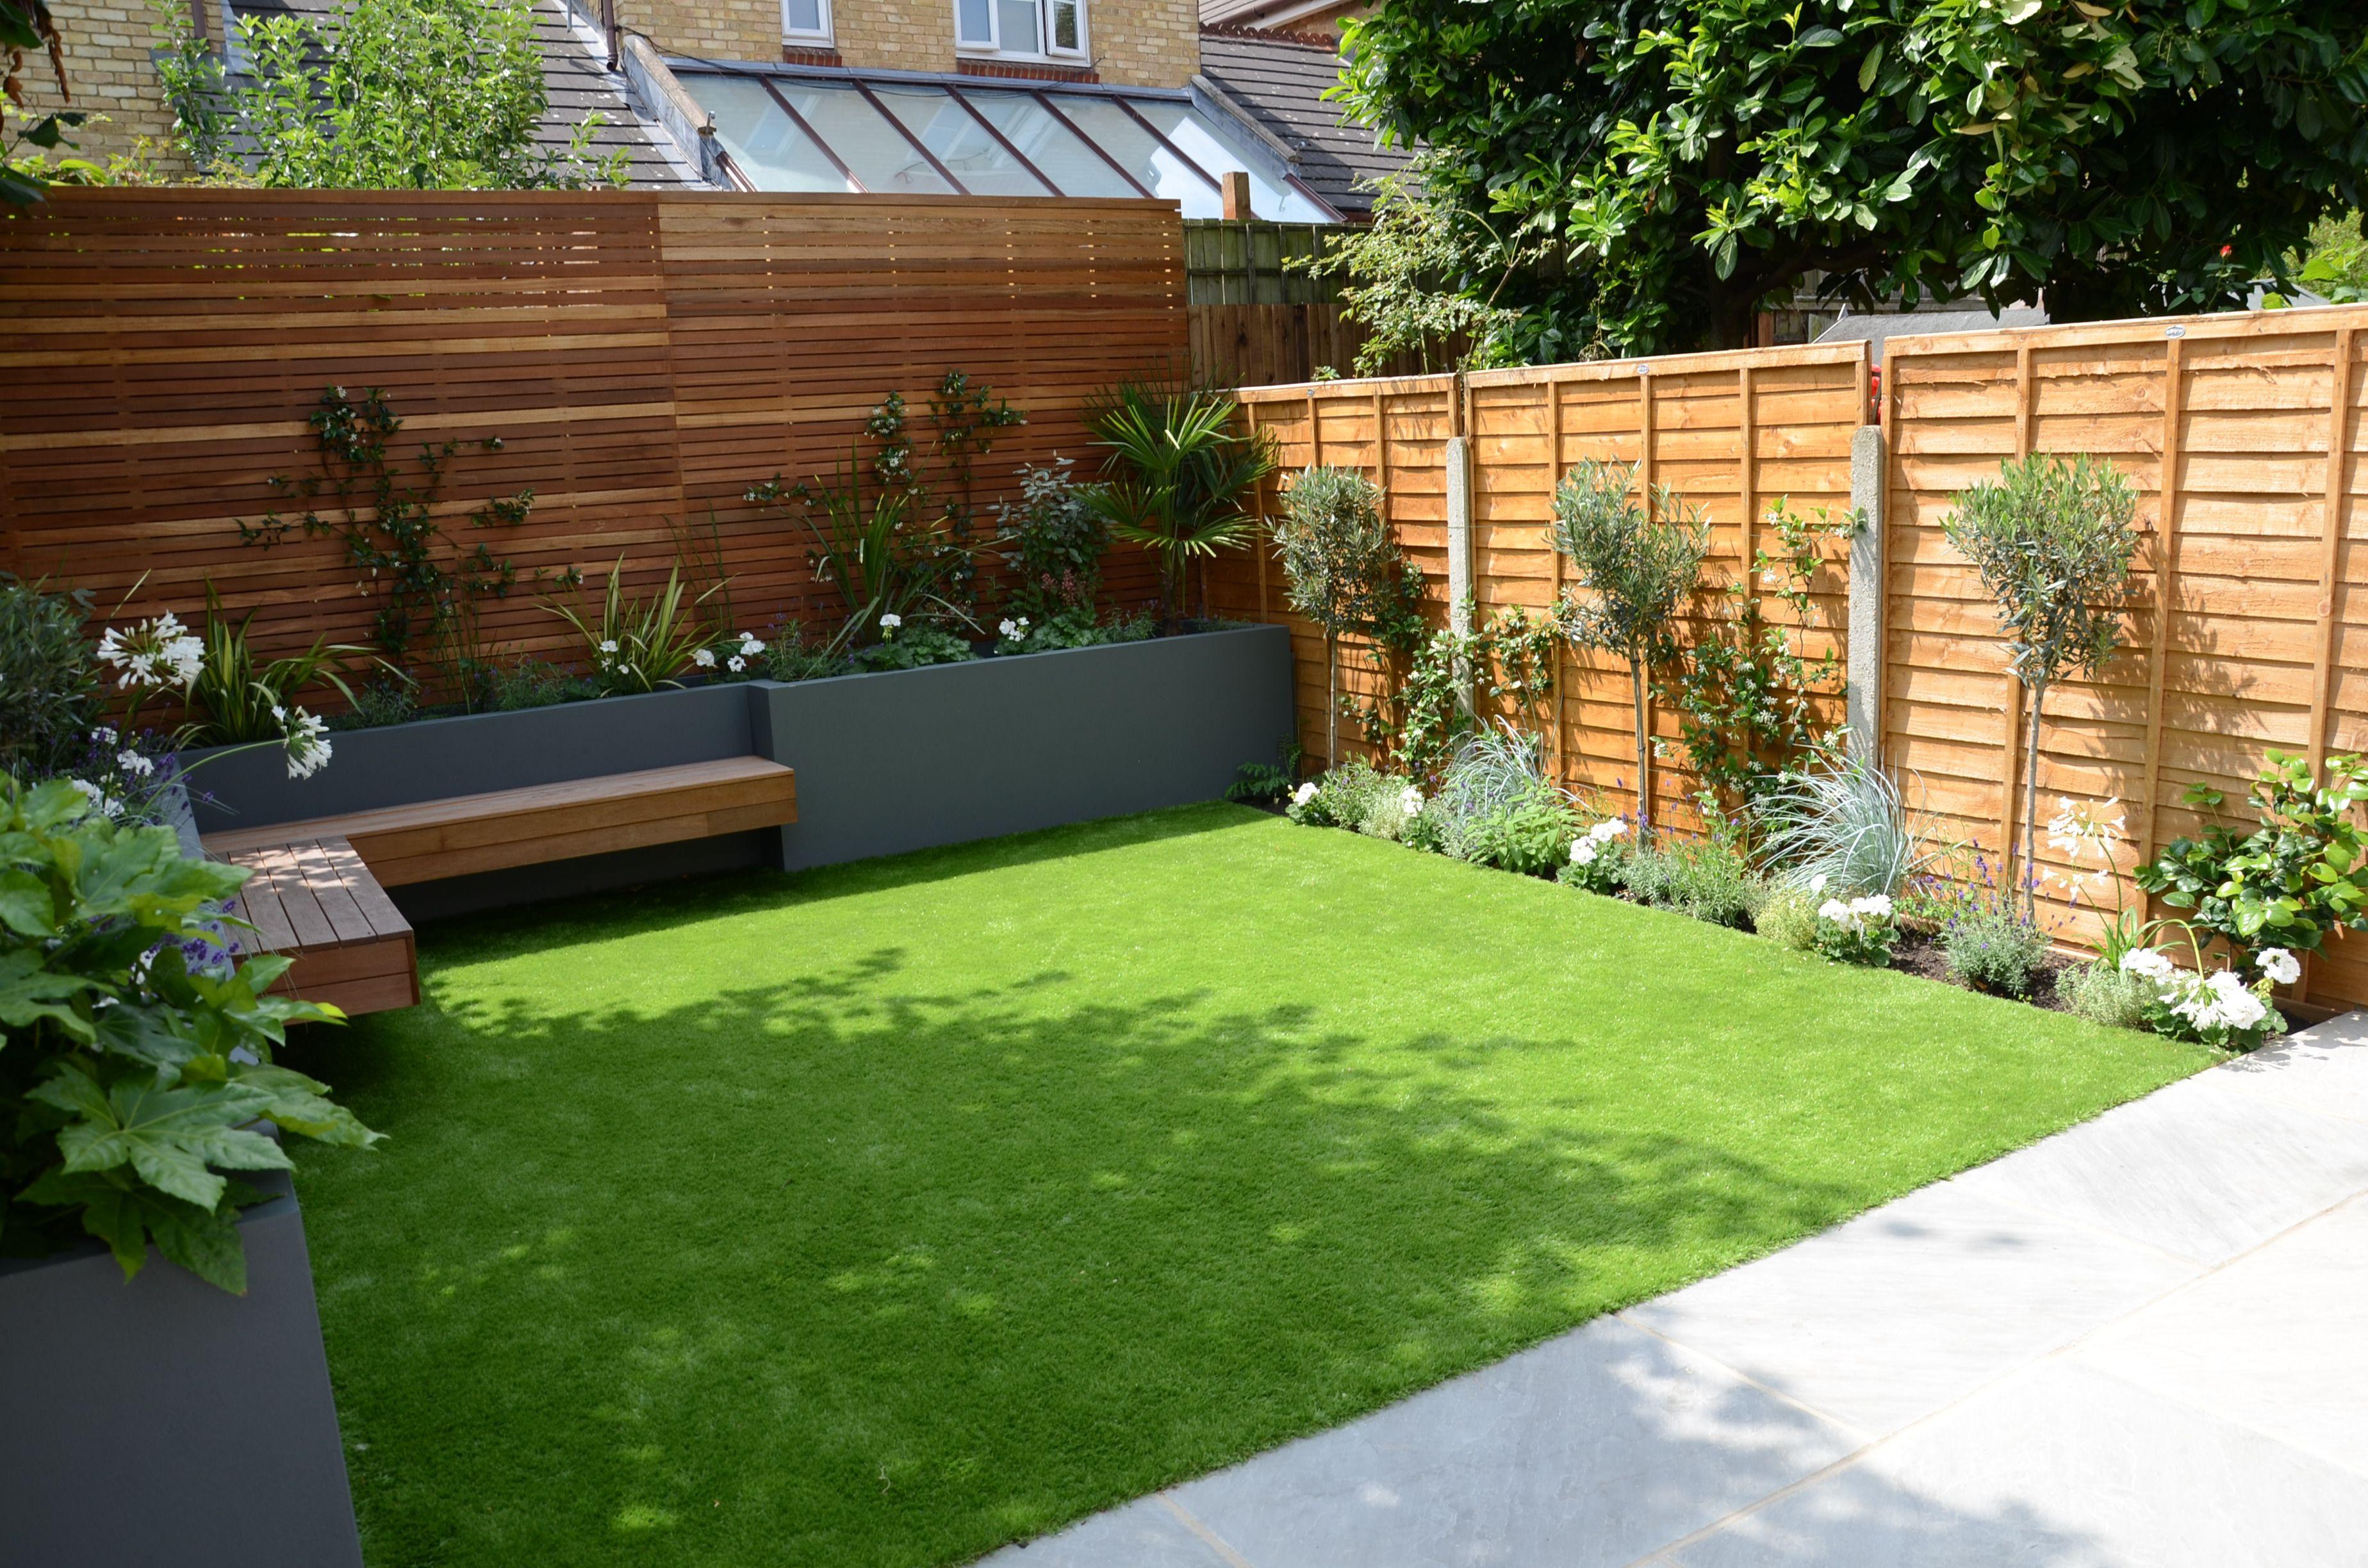 Small Garden Design Fake Grass Low Mainteance Contempoary Design Sleek Fun London Designer Balha… | Small Backyard Gardens, Back Garden Design, Garden Design Layout